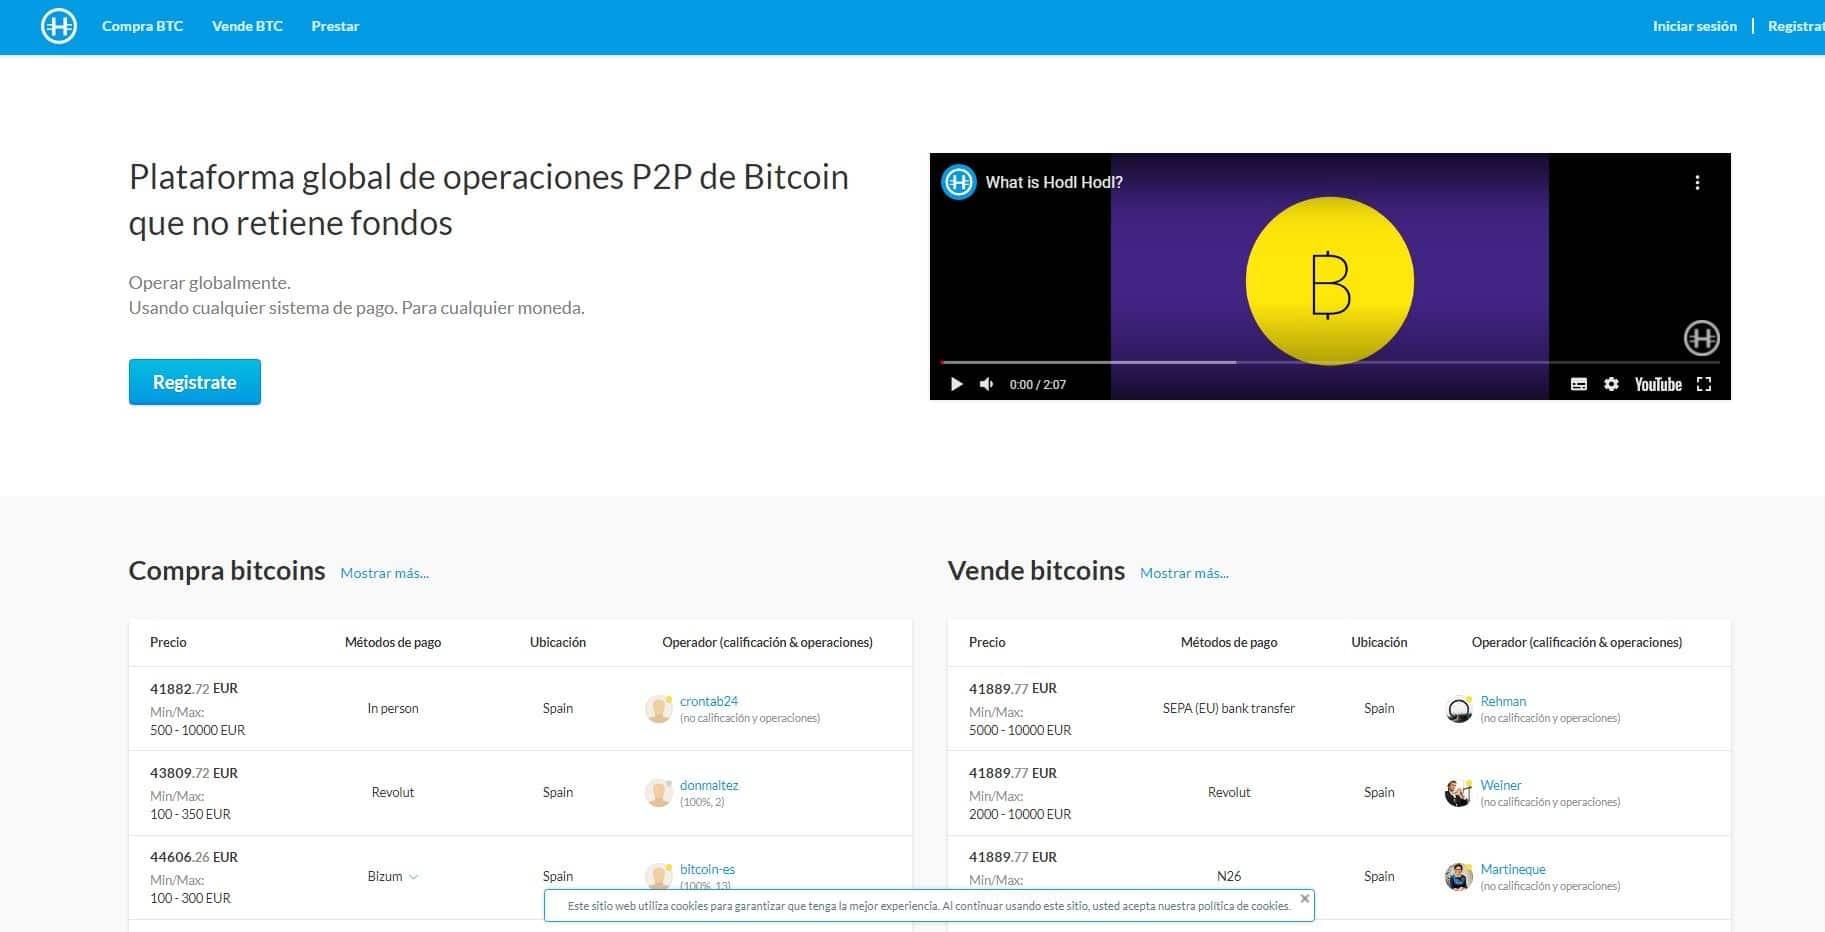 Comprar Bitcoin sin enviar identificacion